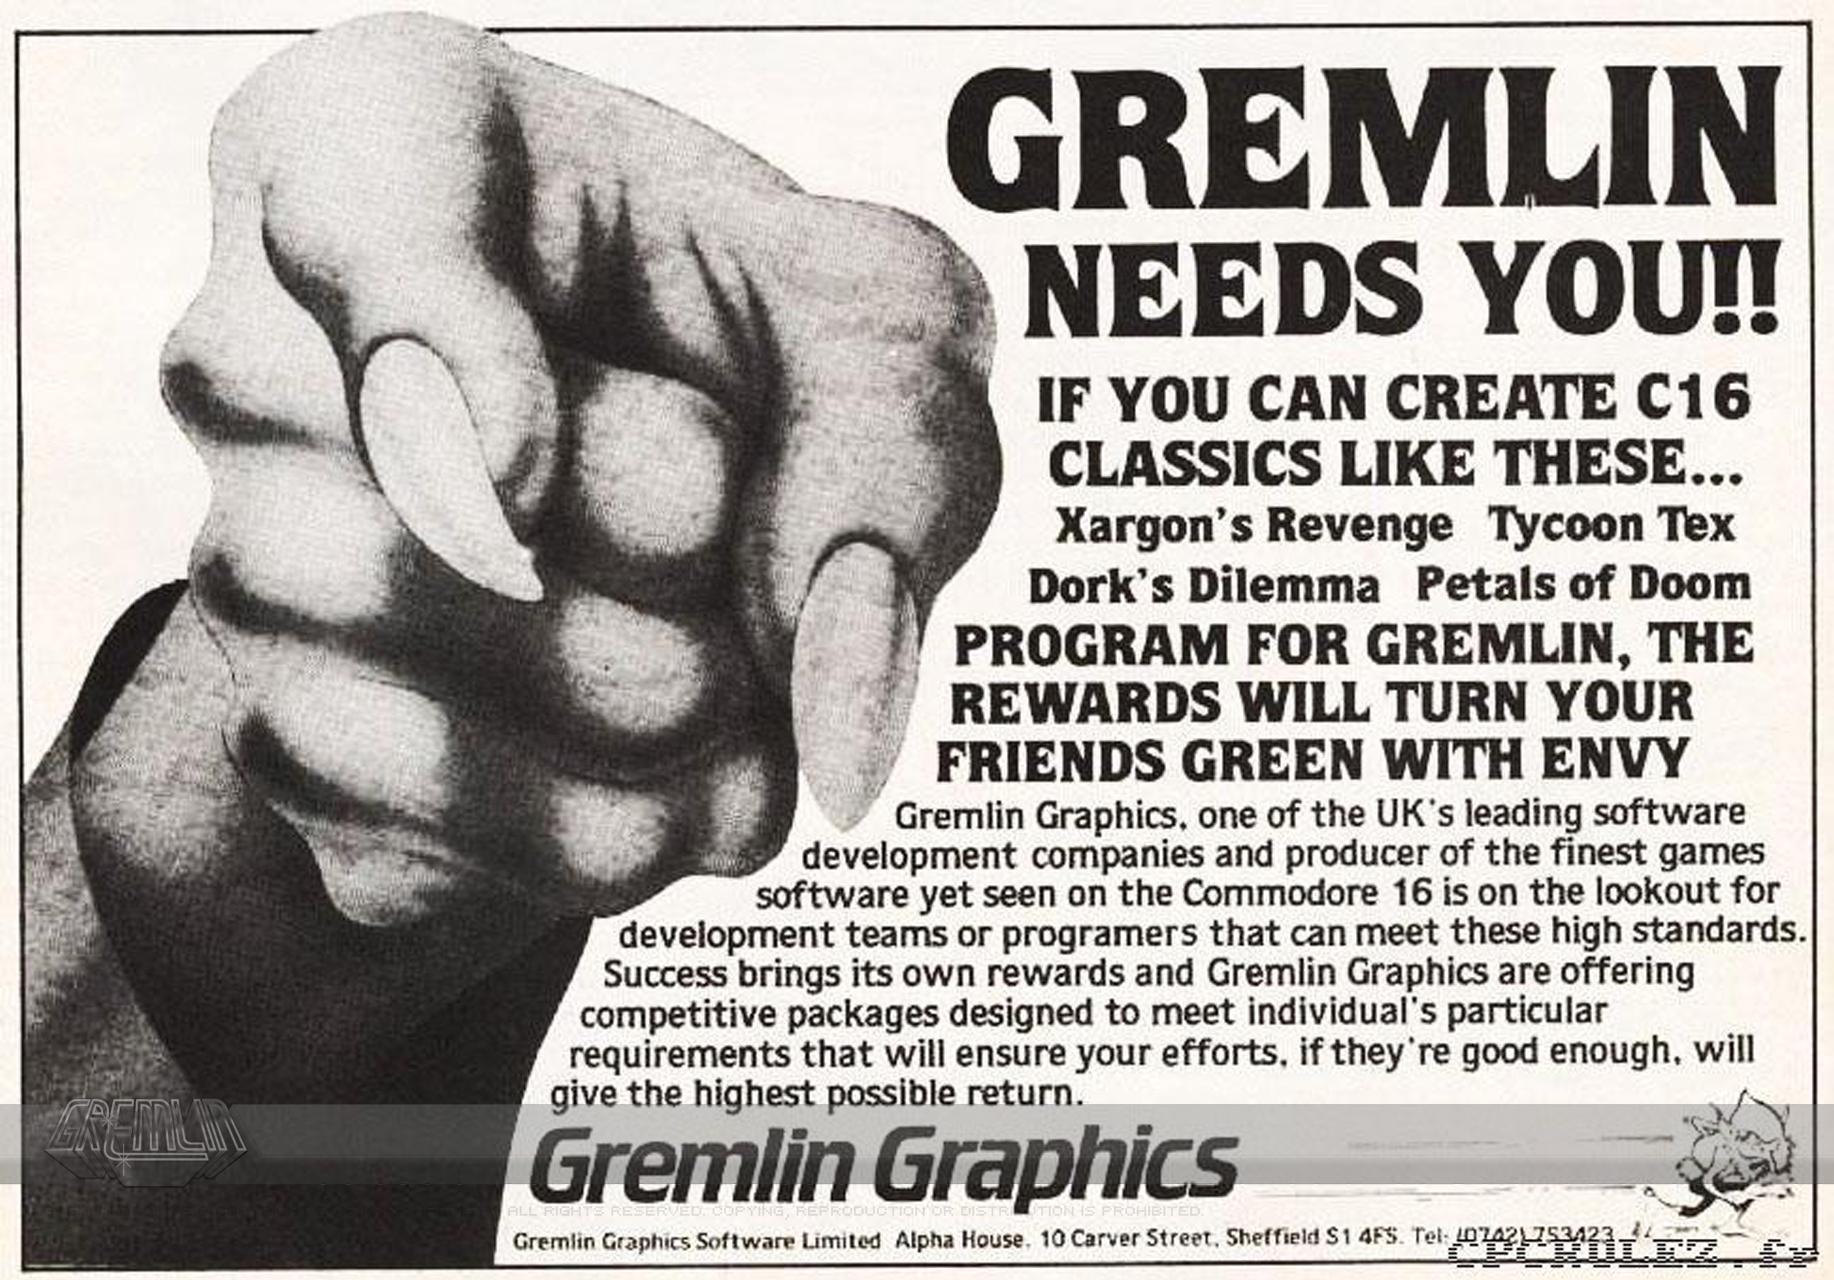 Gremlin needs You!